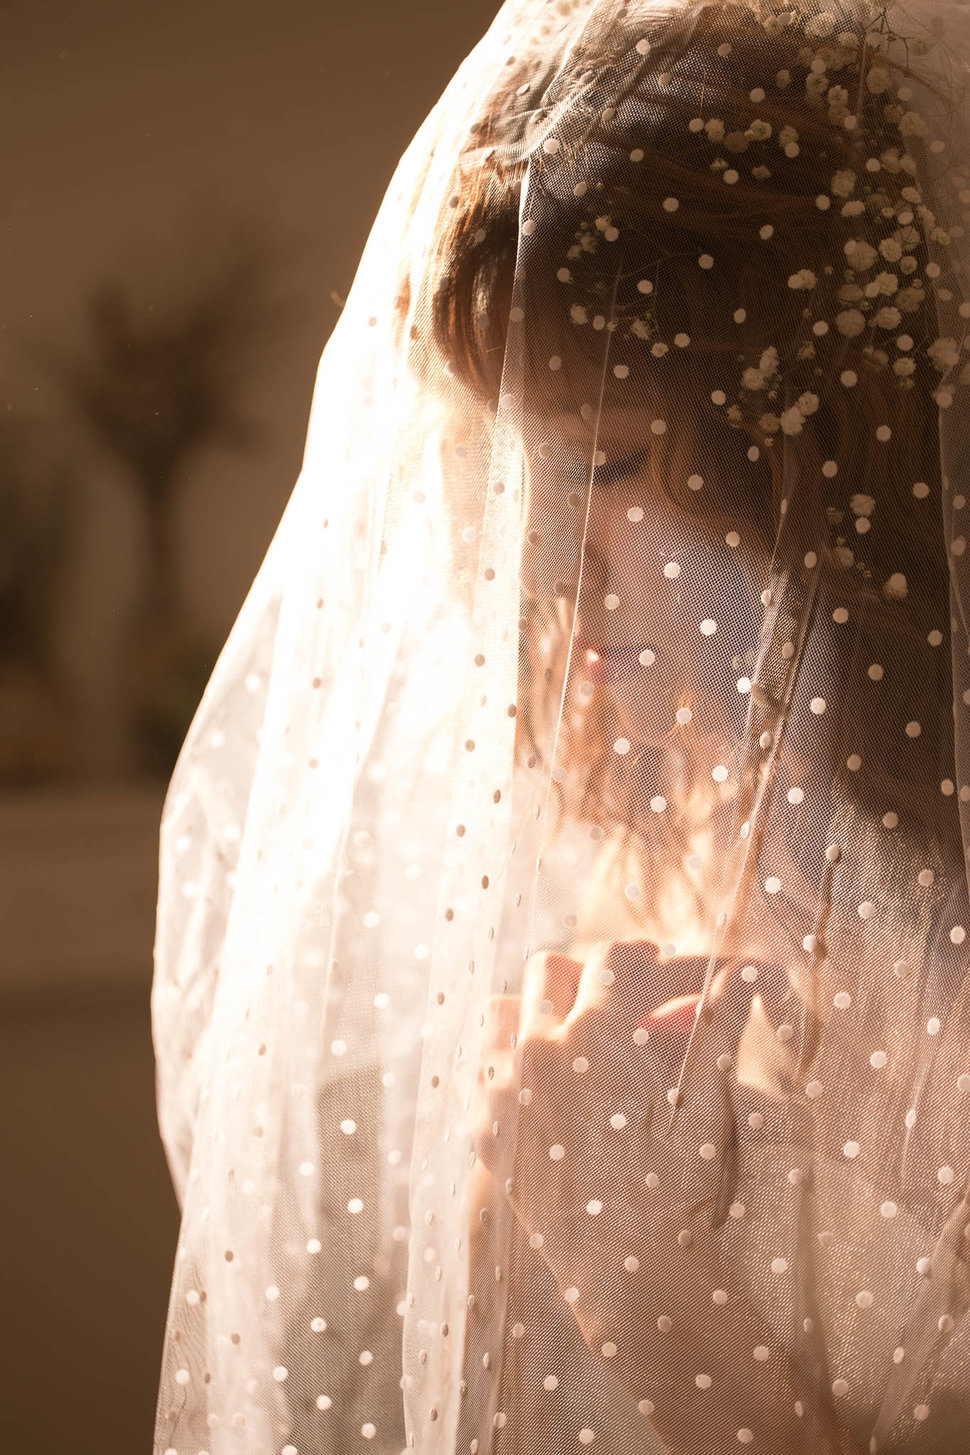 18PHOTO自主婚紗-潤兒(編號:406266) - 18PHOTO 婚紗影像攝影工作室 - 結婚吧一站式婚禮服務平台